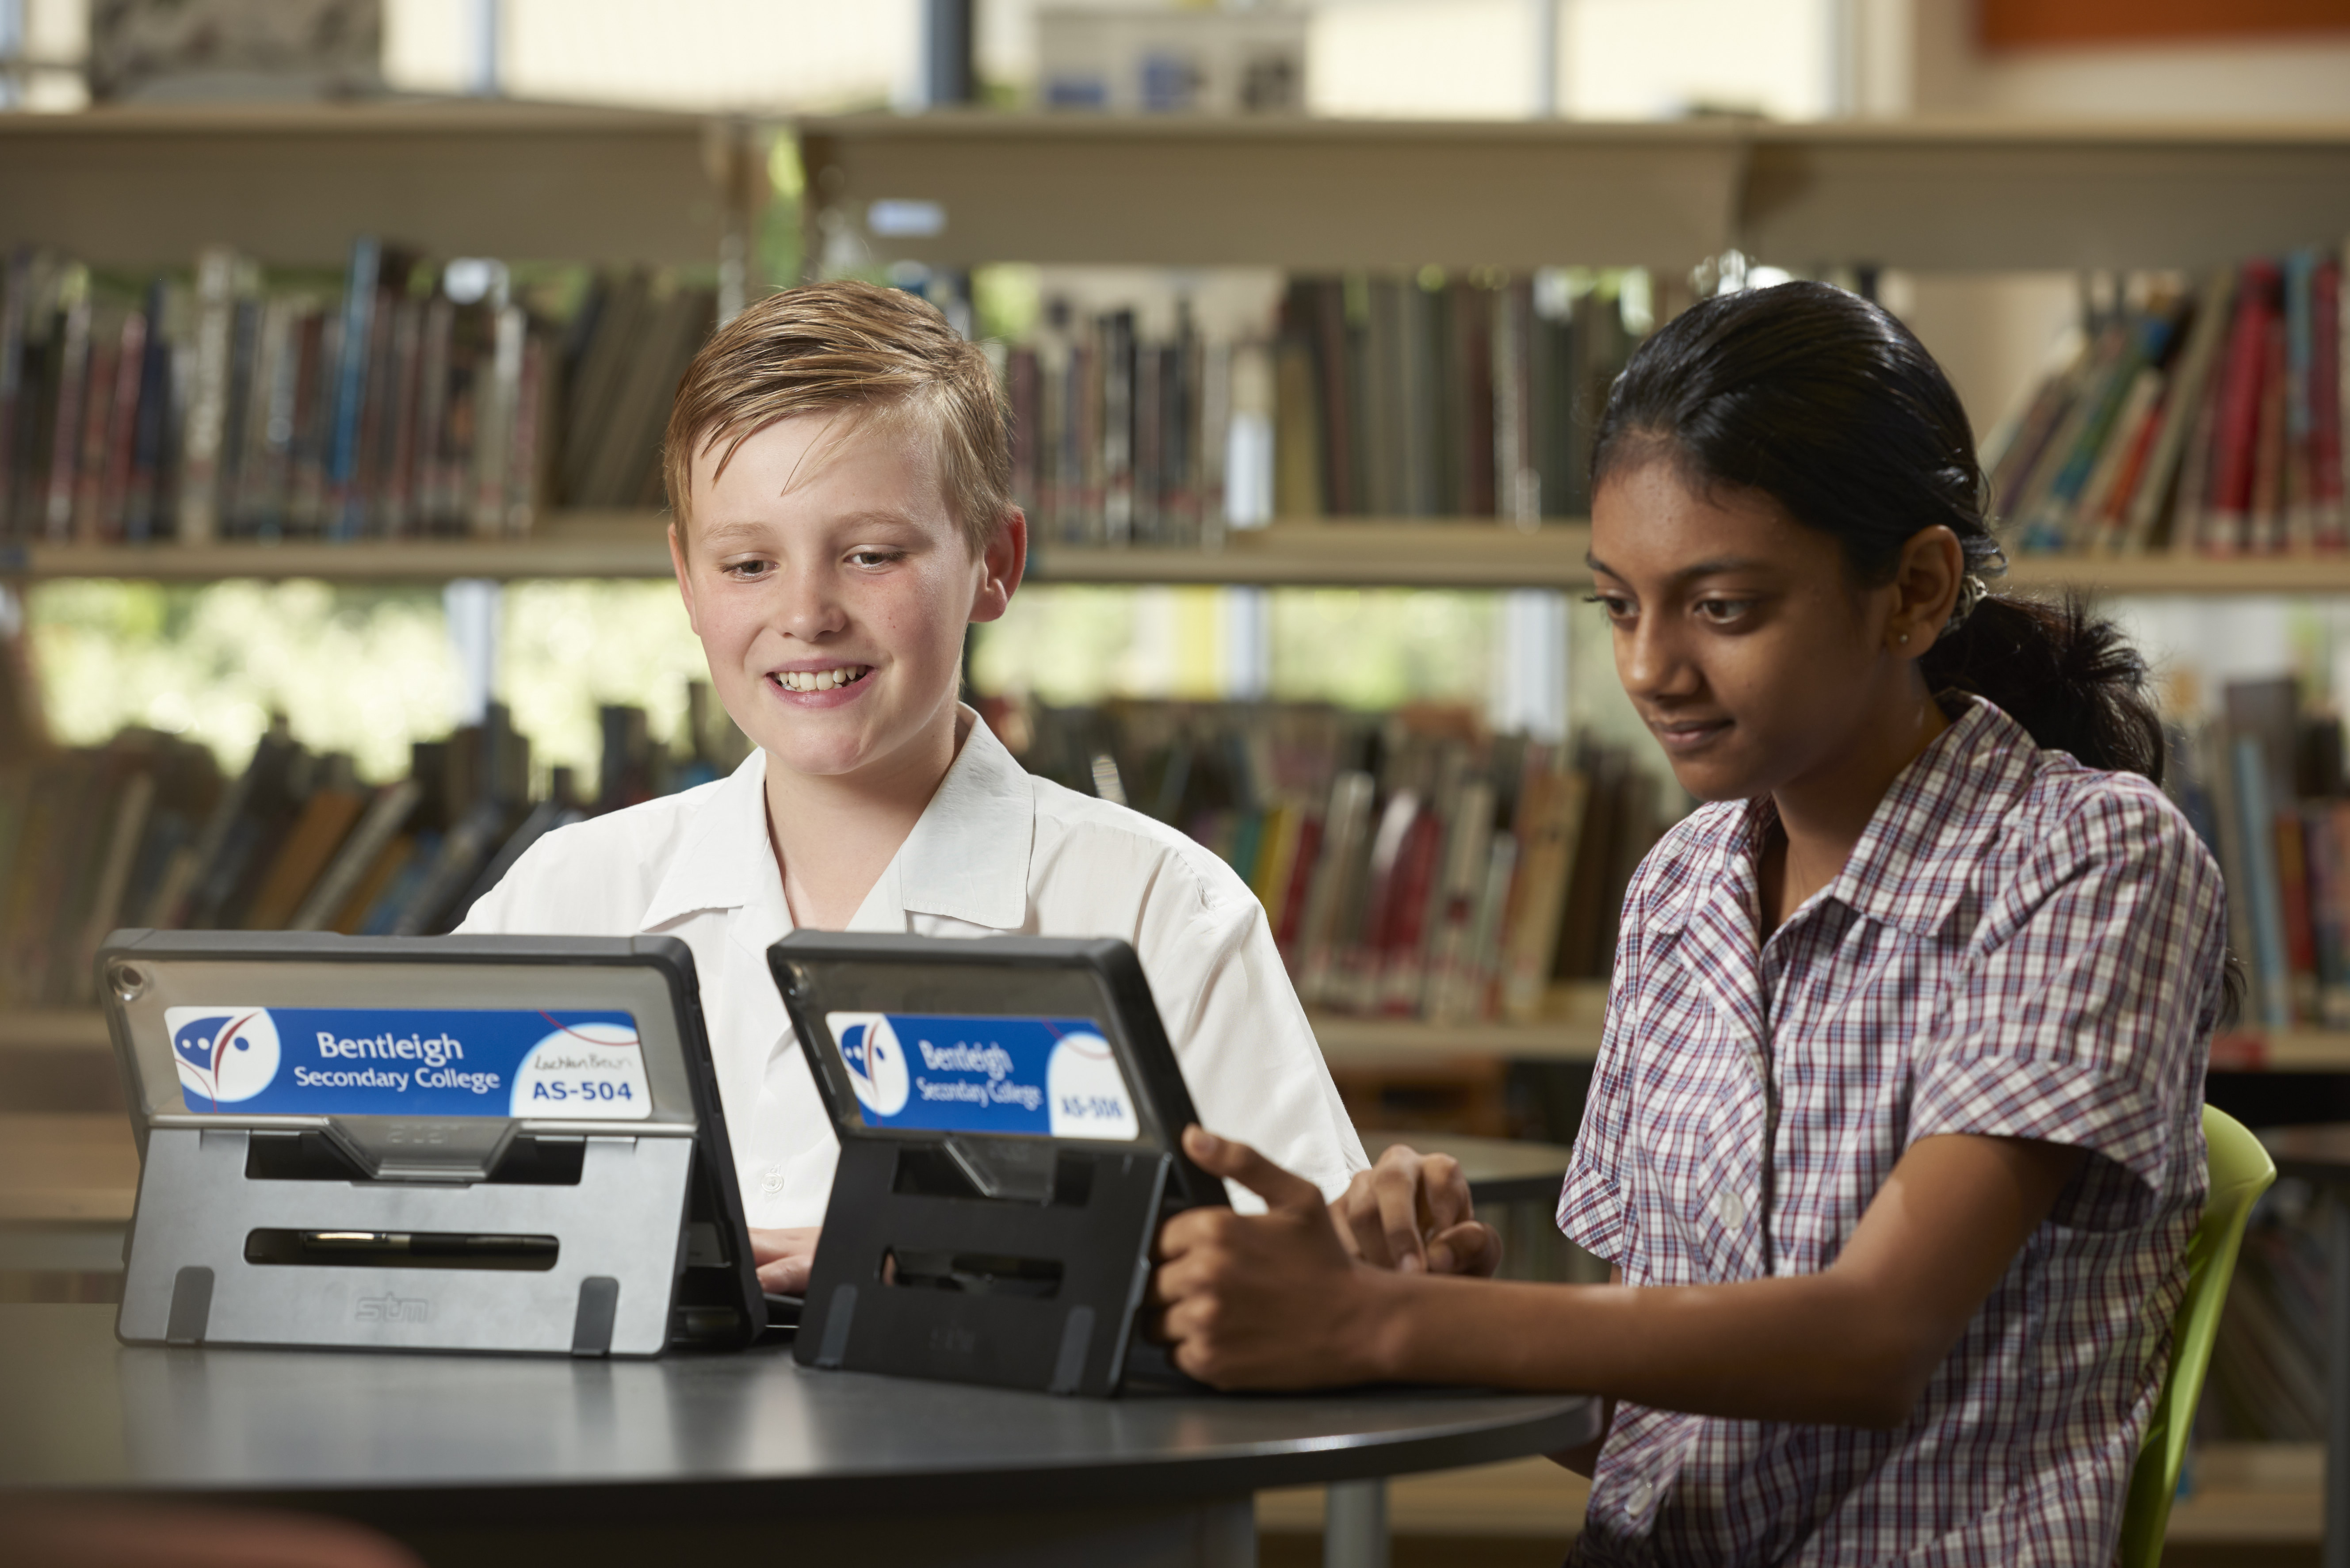 http://bentleighsc.vic.edu.au/uploaded_files/media/bentleigh_001.jpg